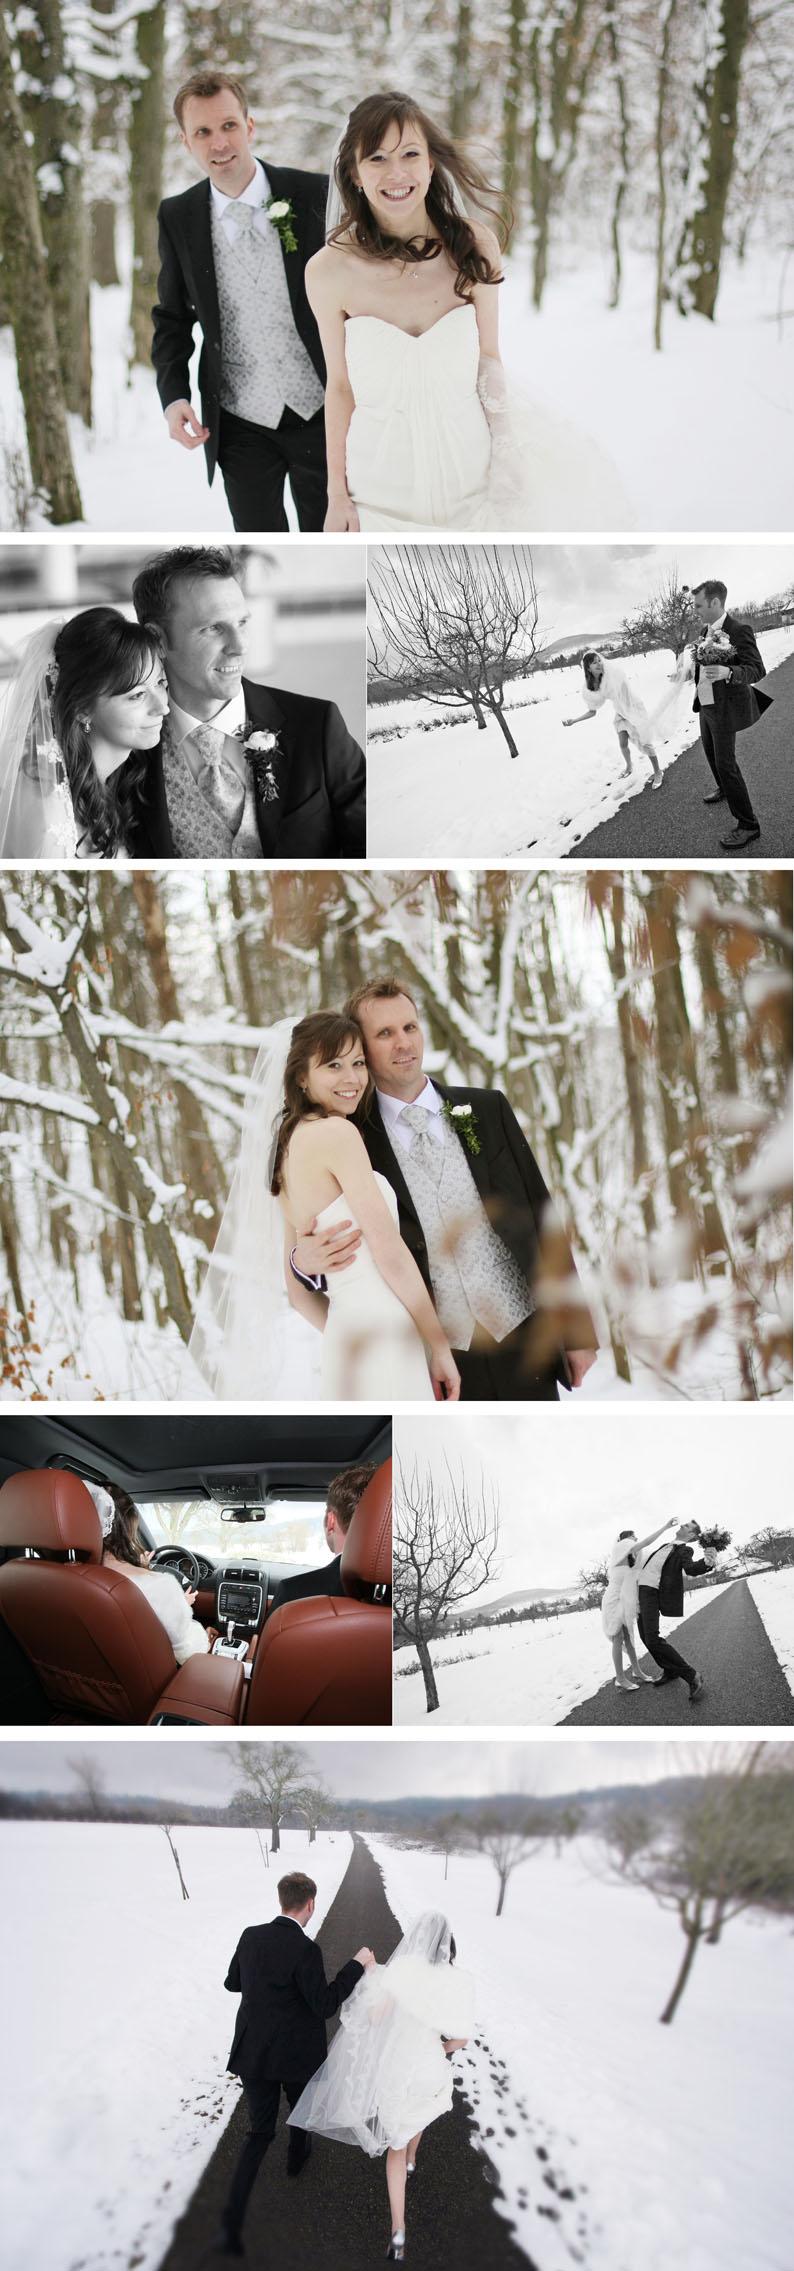 Hochzeitsfotograf Kurhaus Bad Boll Seminaris